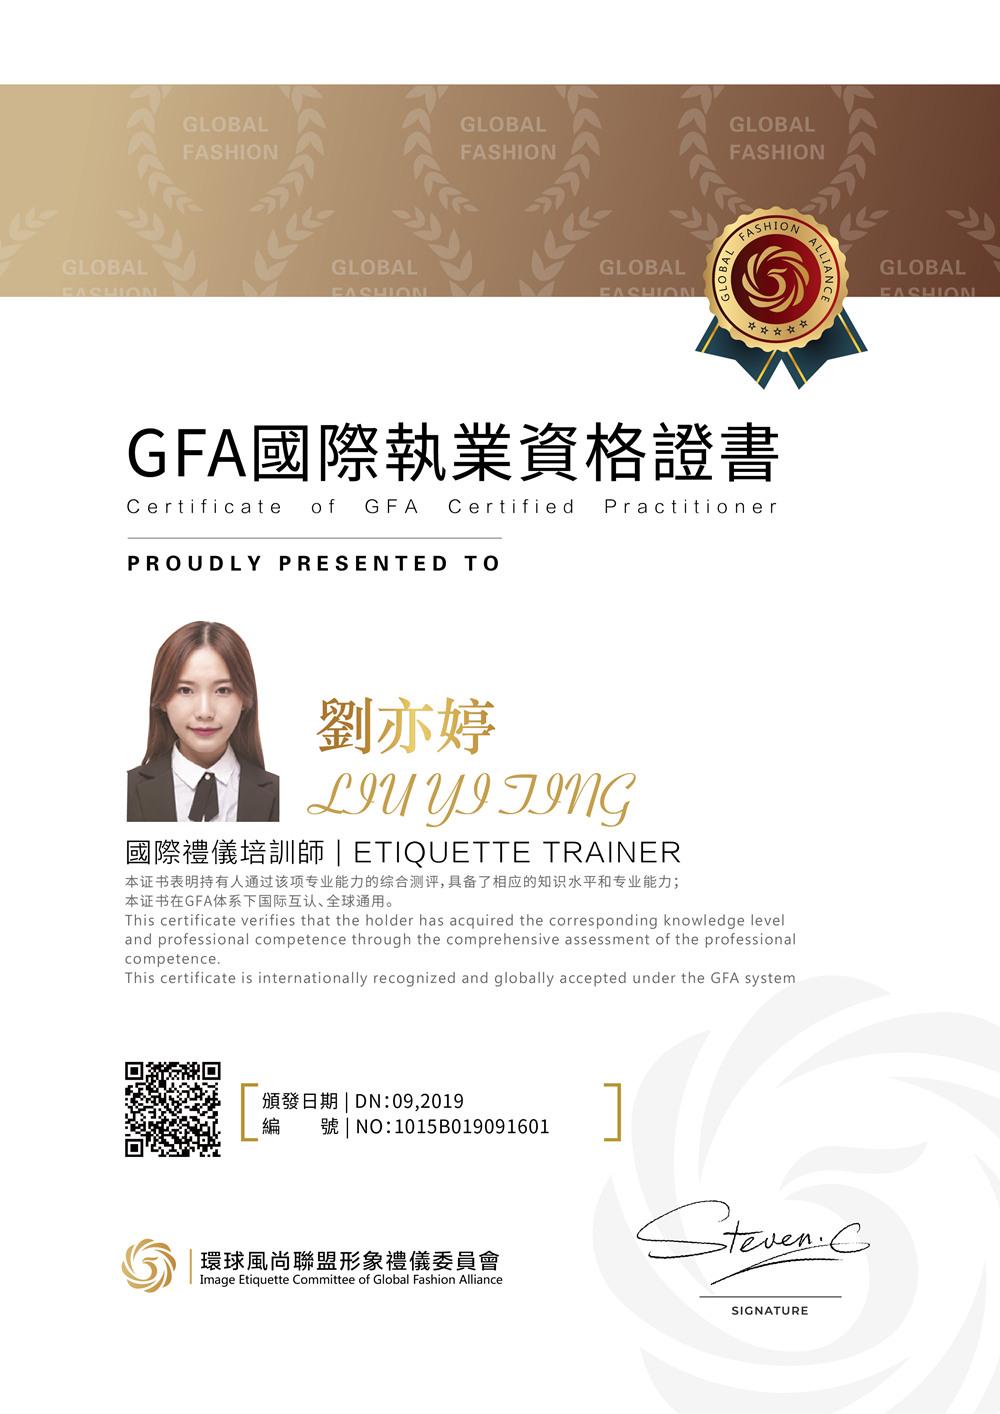 GFA国际执业资格证书